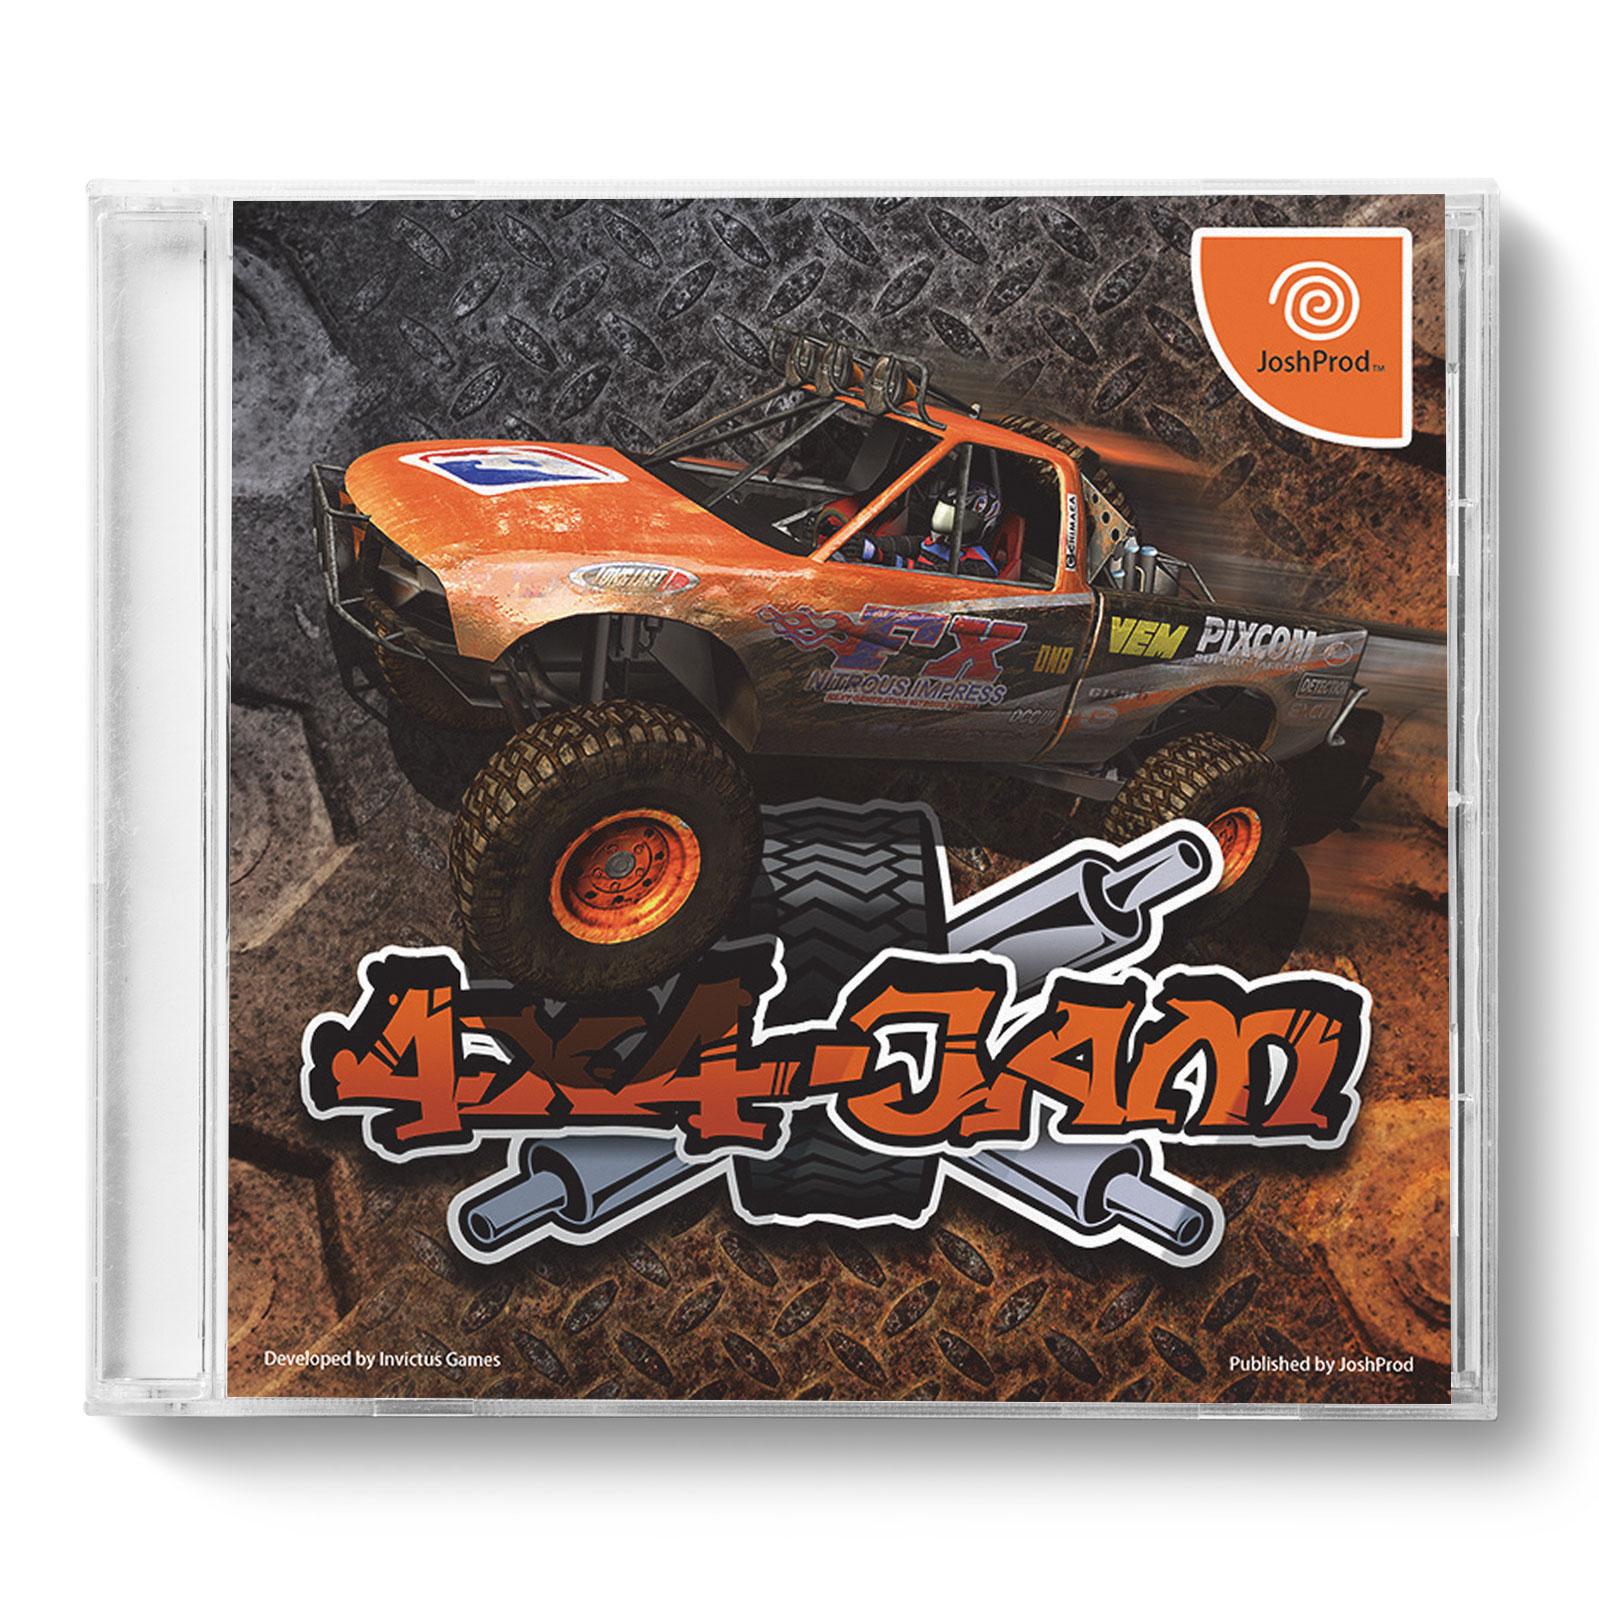 4x4-jam-prodyct-front-a.jpg